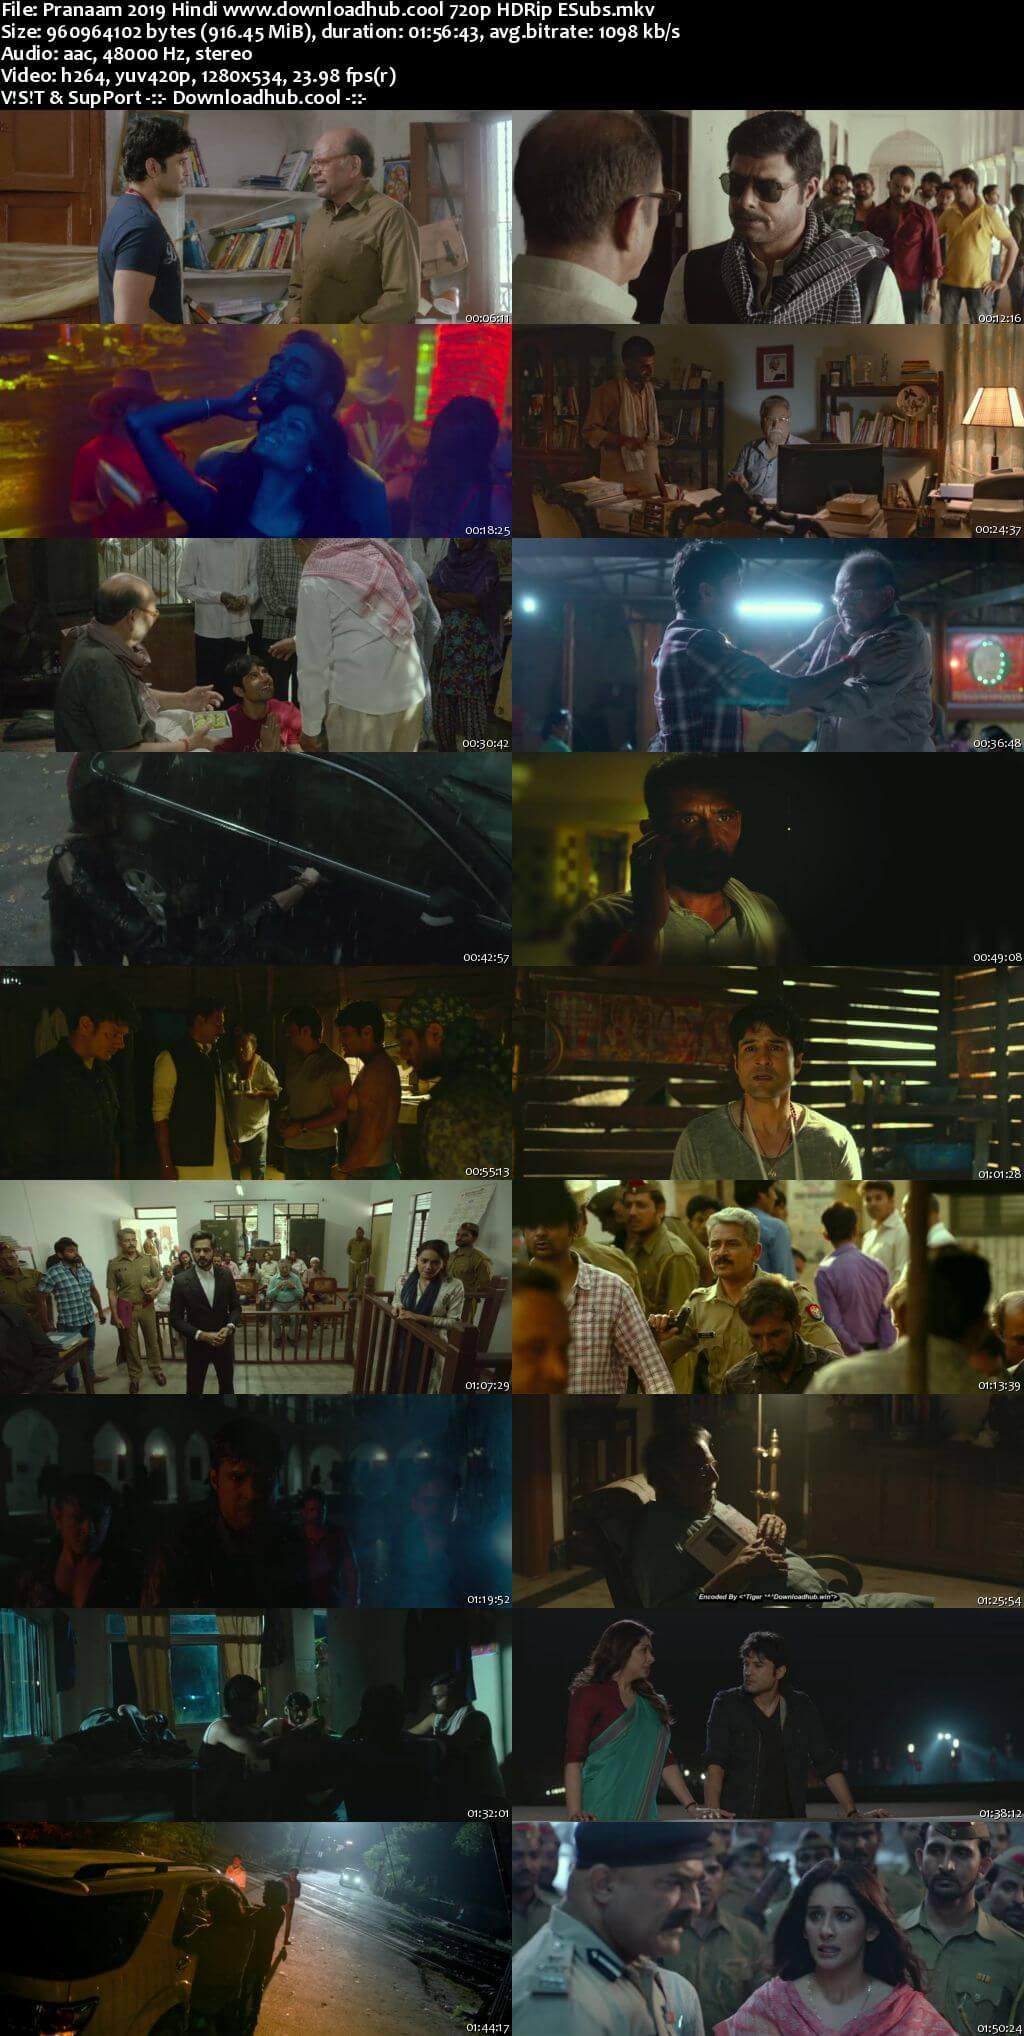 Pranaam 2019 Hindi 720p HDRip ESubs